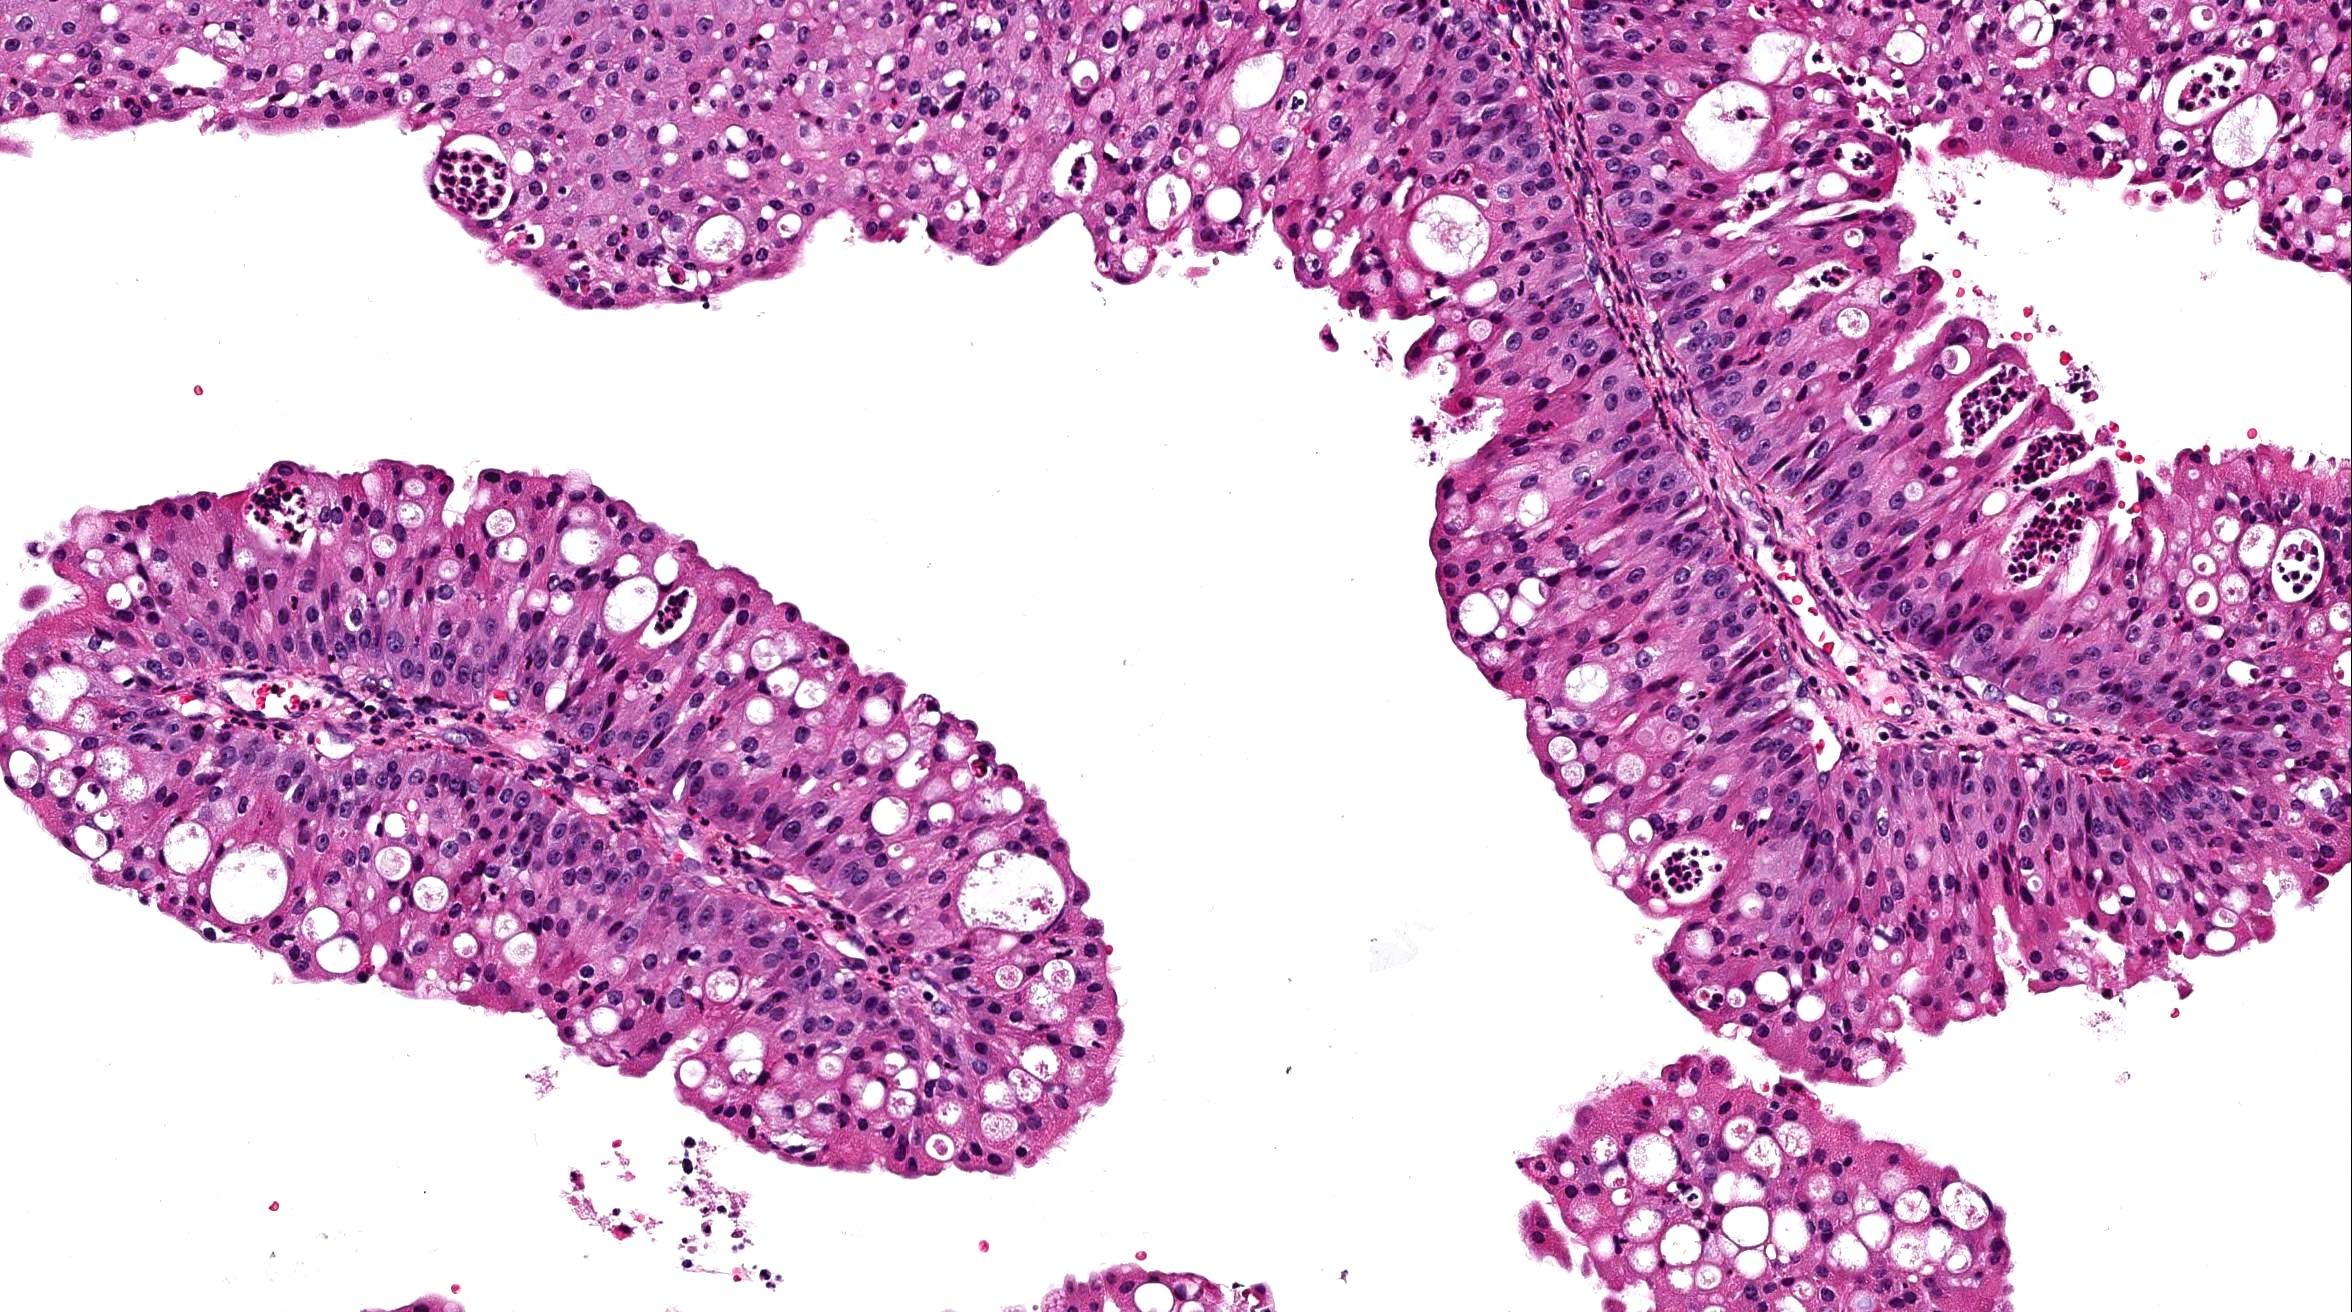 papiloma urotelial pathology outlines)